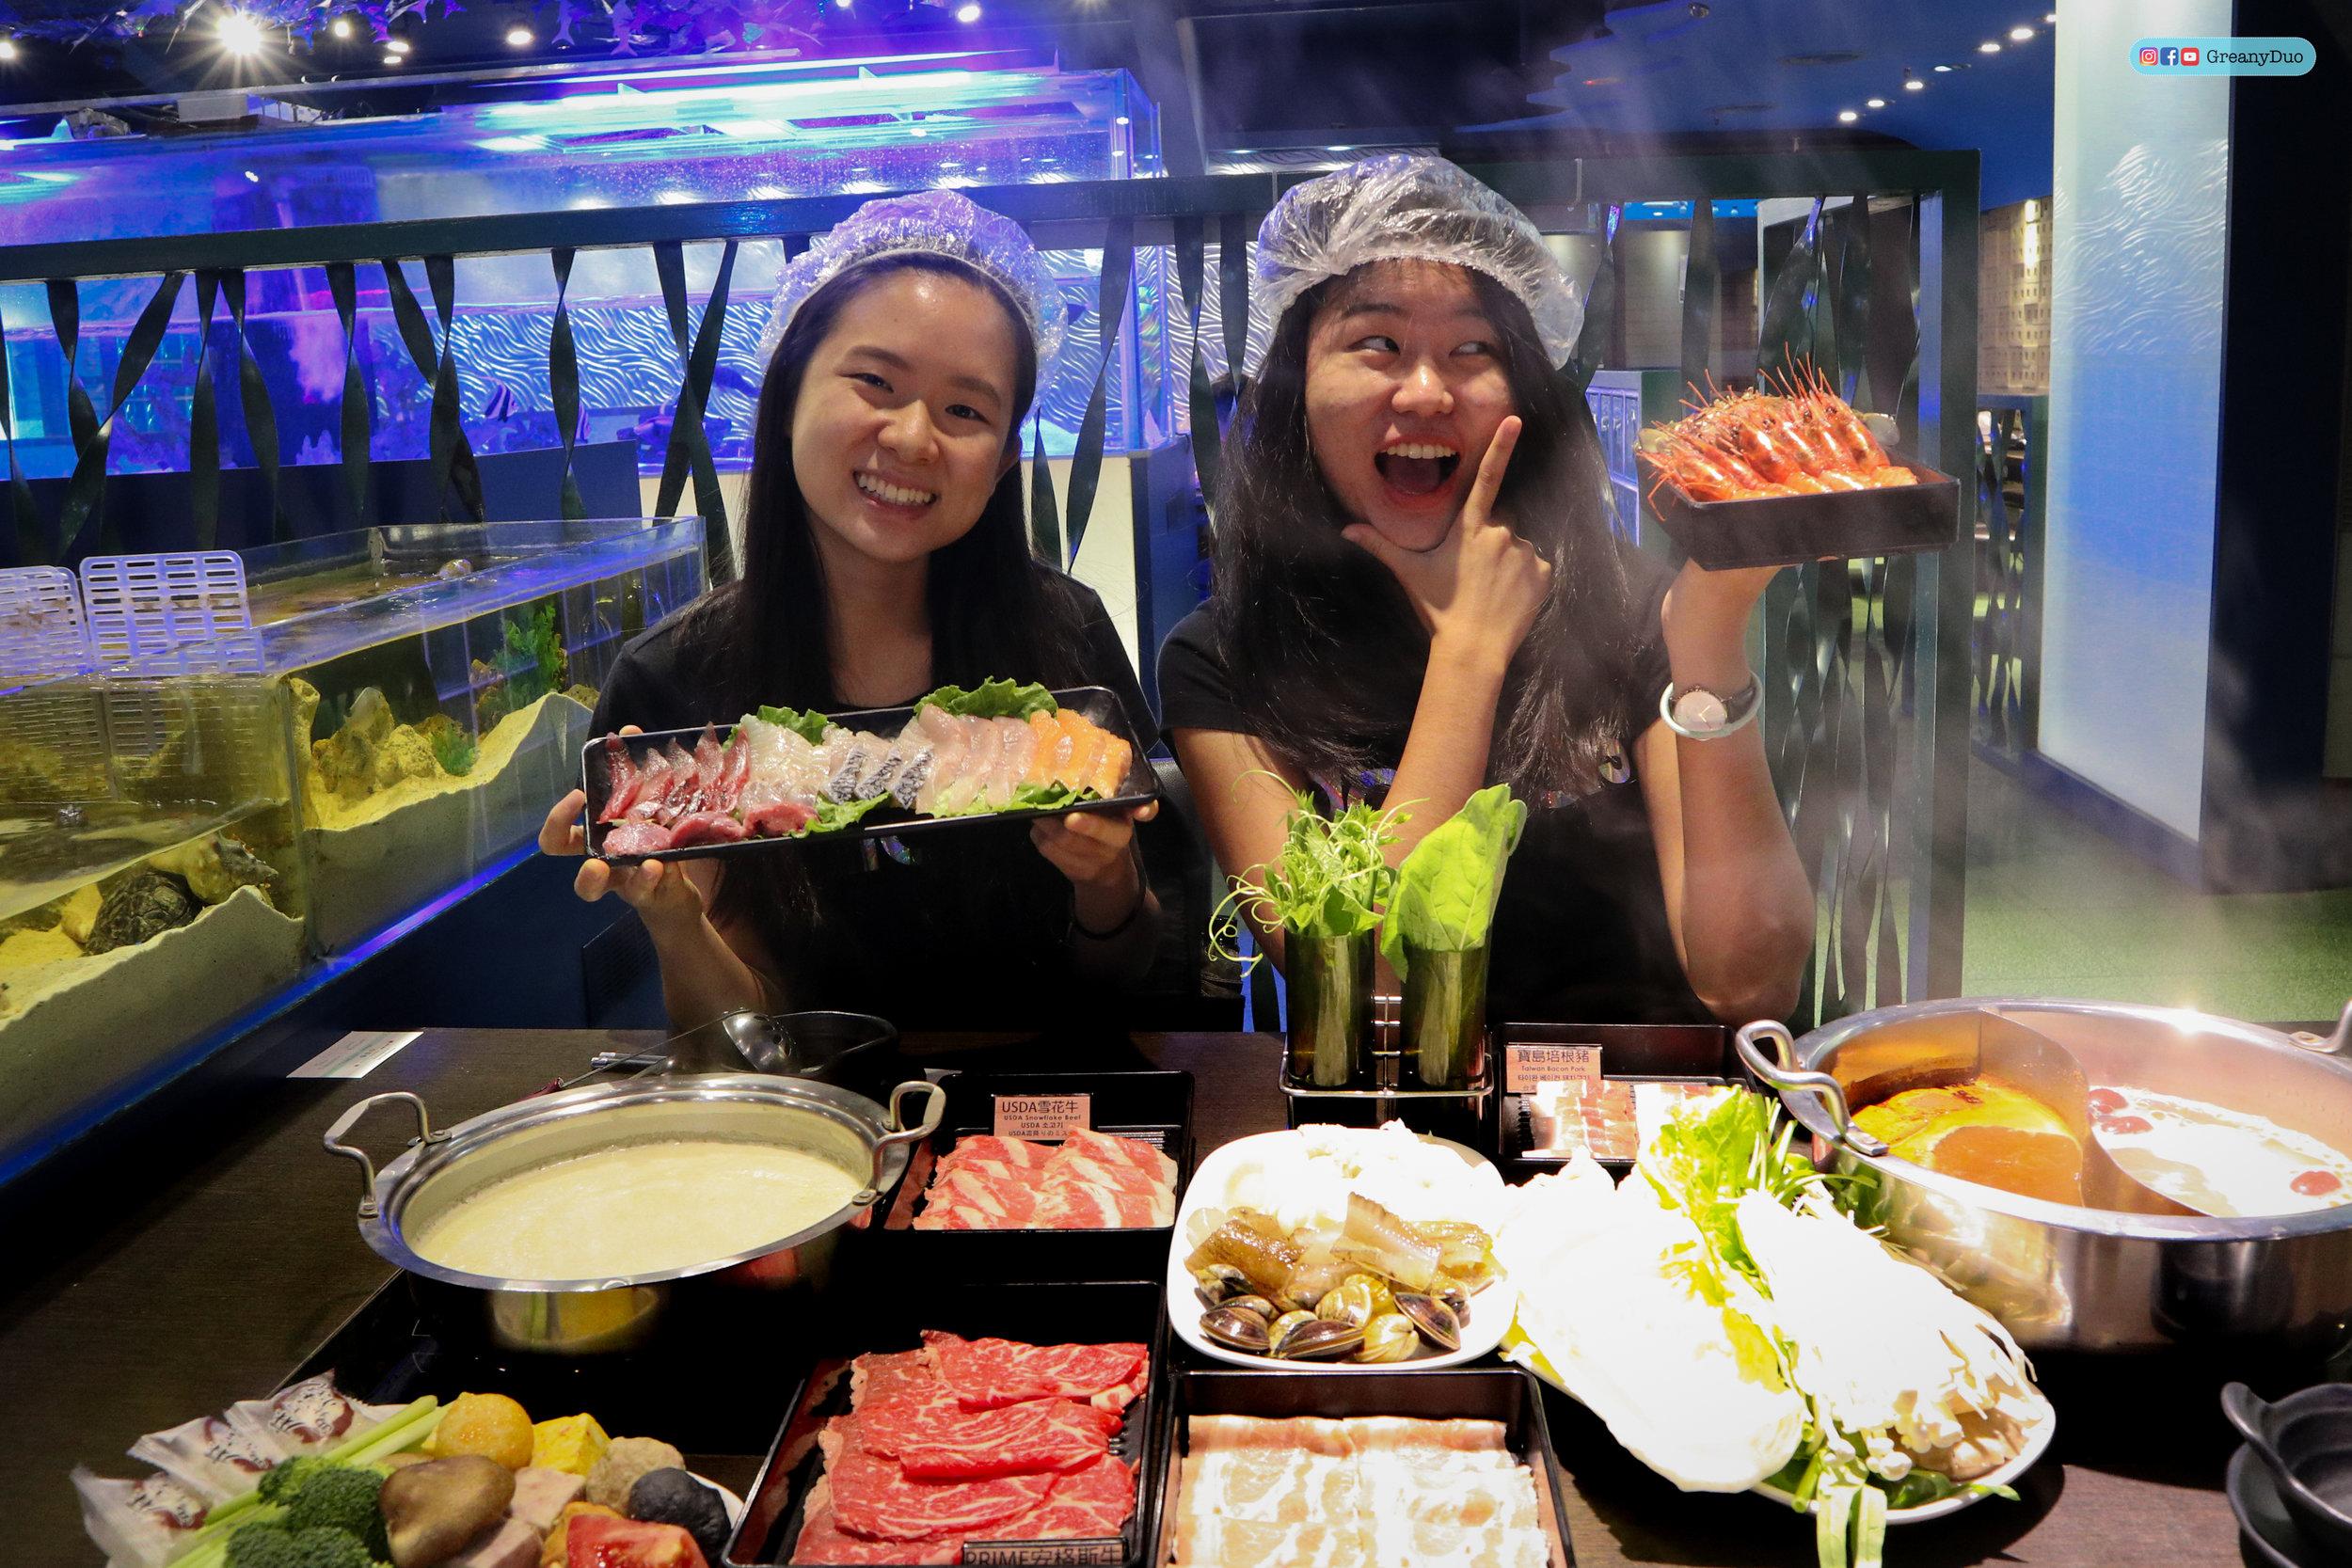 jenny & tina dining at บุฟเฟ่ต์ชาบูไต้หวันที่ Hakkai Shabu Shabu ซีเหมินติง